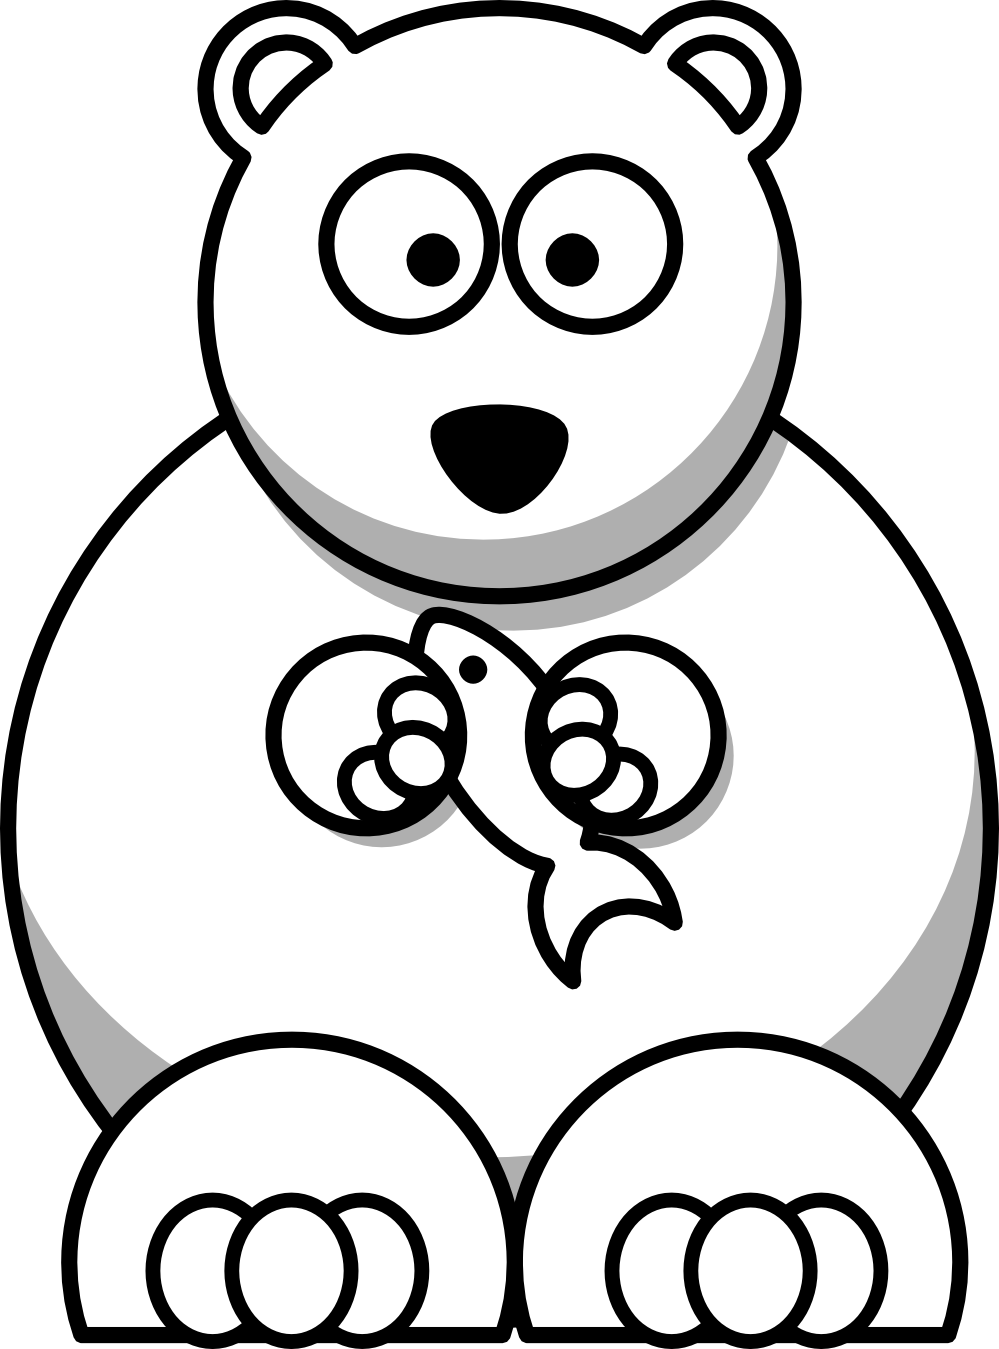 ... Polar Bear Clipart Black And White Lemmling cartoon bear black: galleryhip.com/christmas-polar-bear-clipart-black-and-white.html